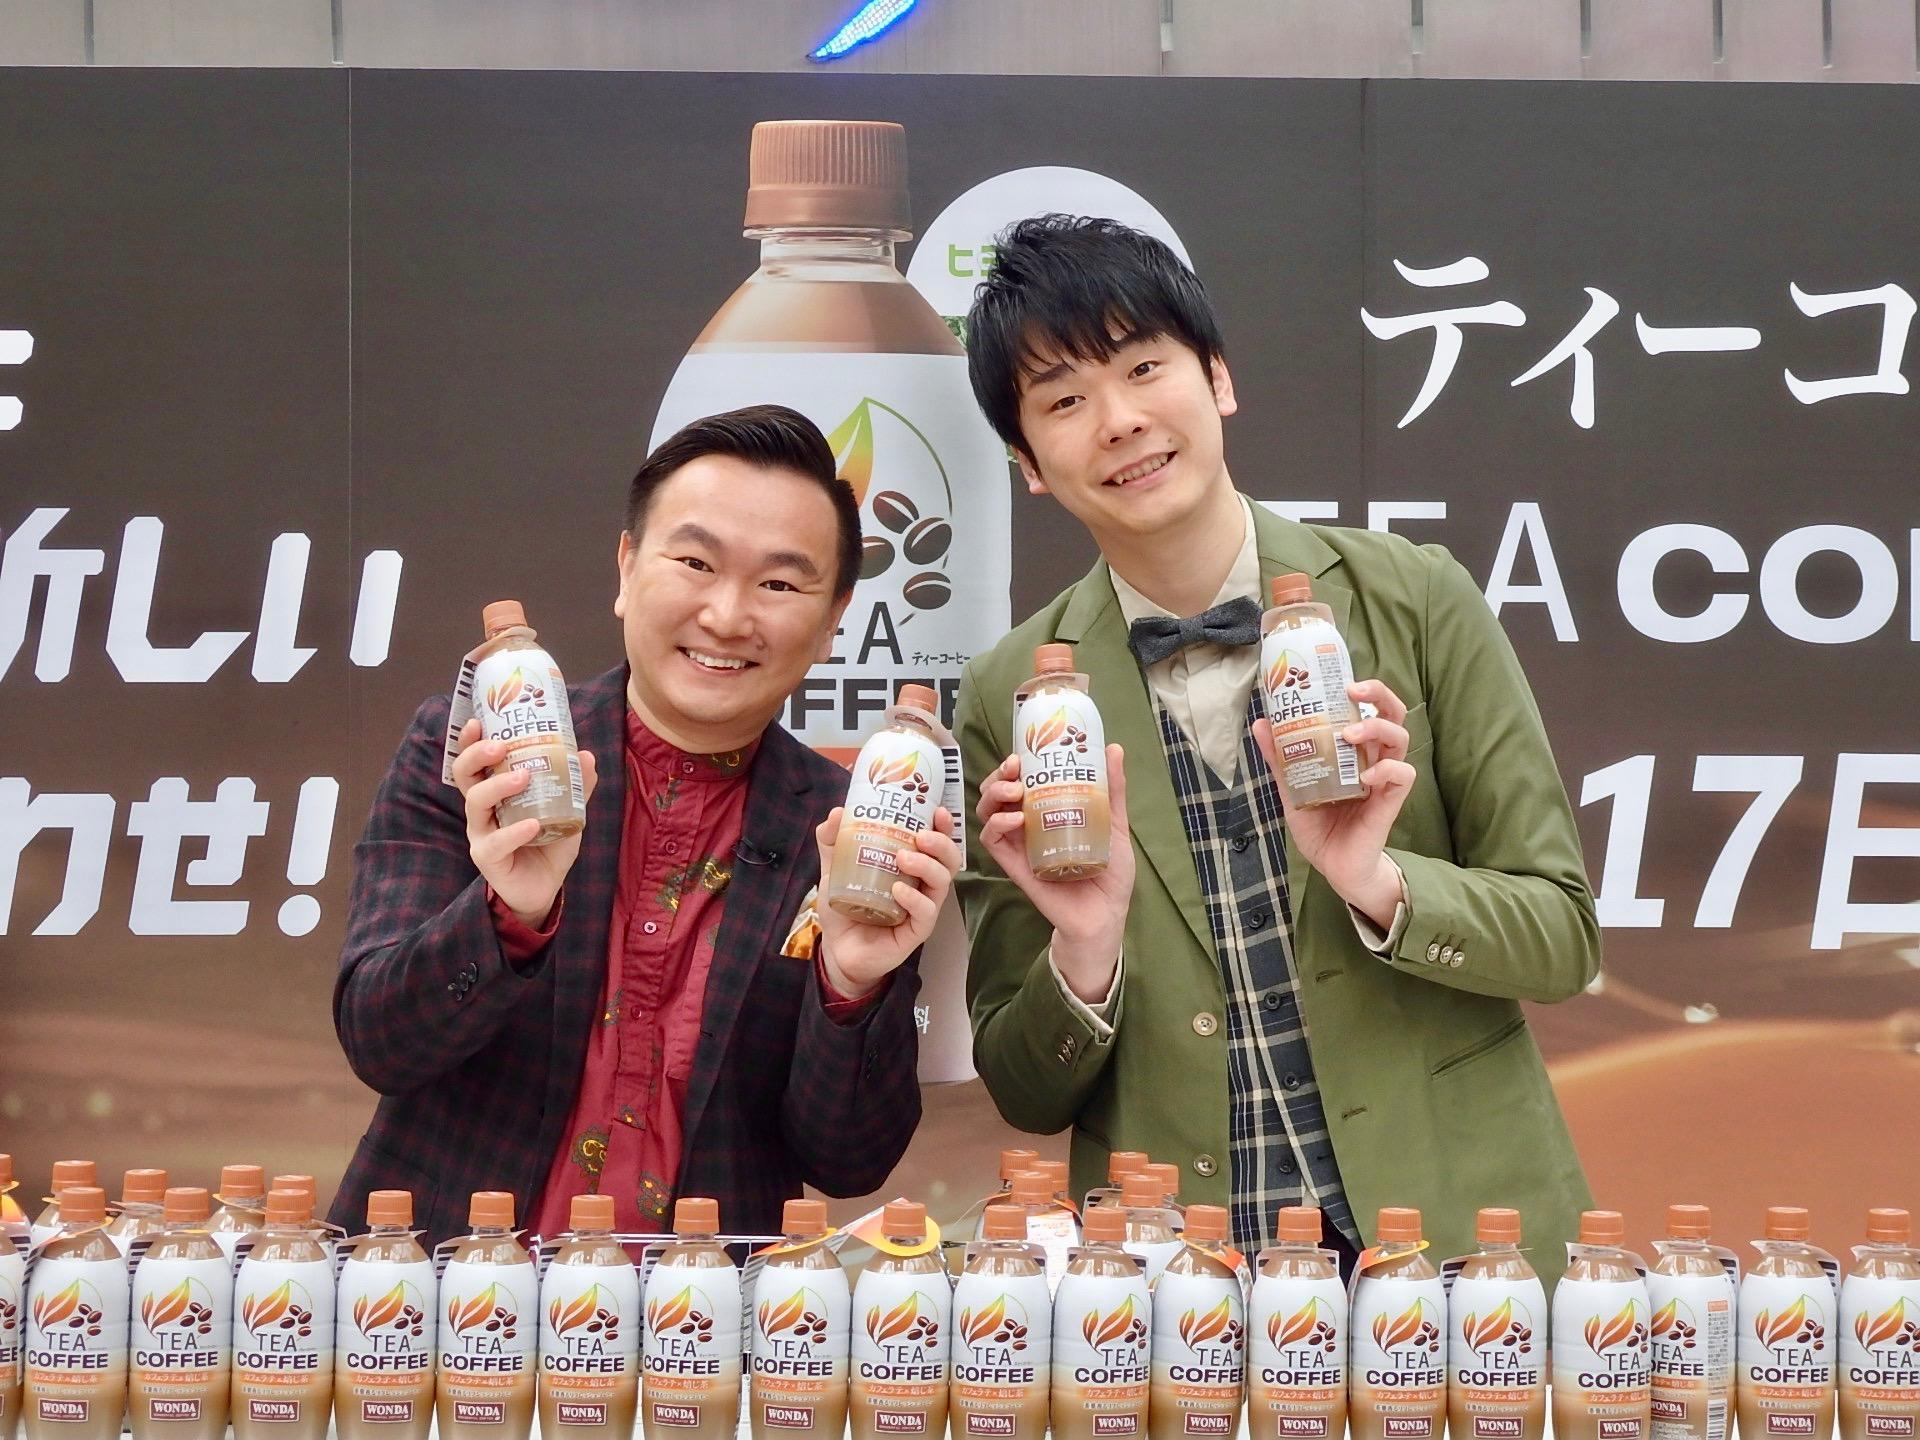 http://news.yoshimoto.co.jp/20180414164658-8c827f541ea0d1556283fd625f021f8a265e7018.jpg